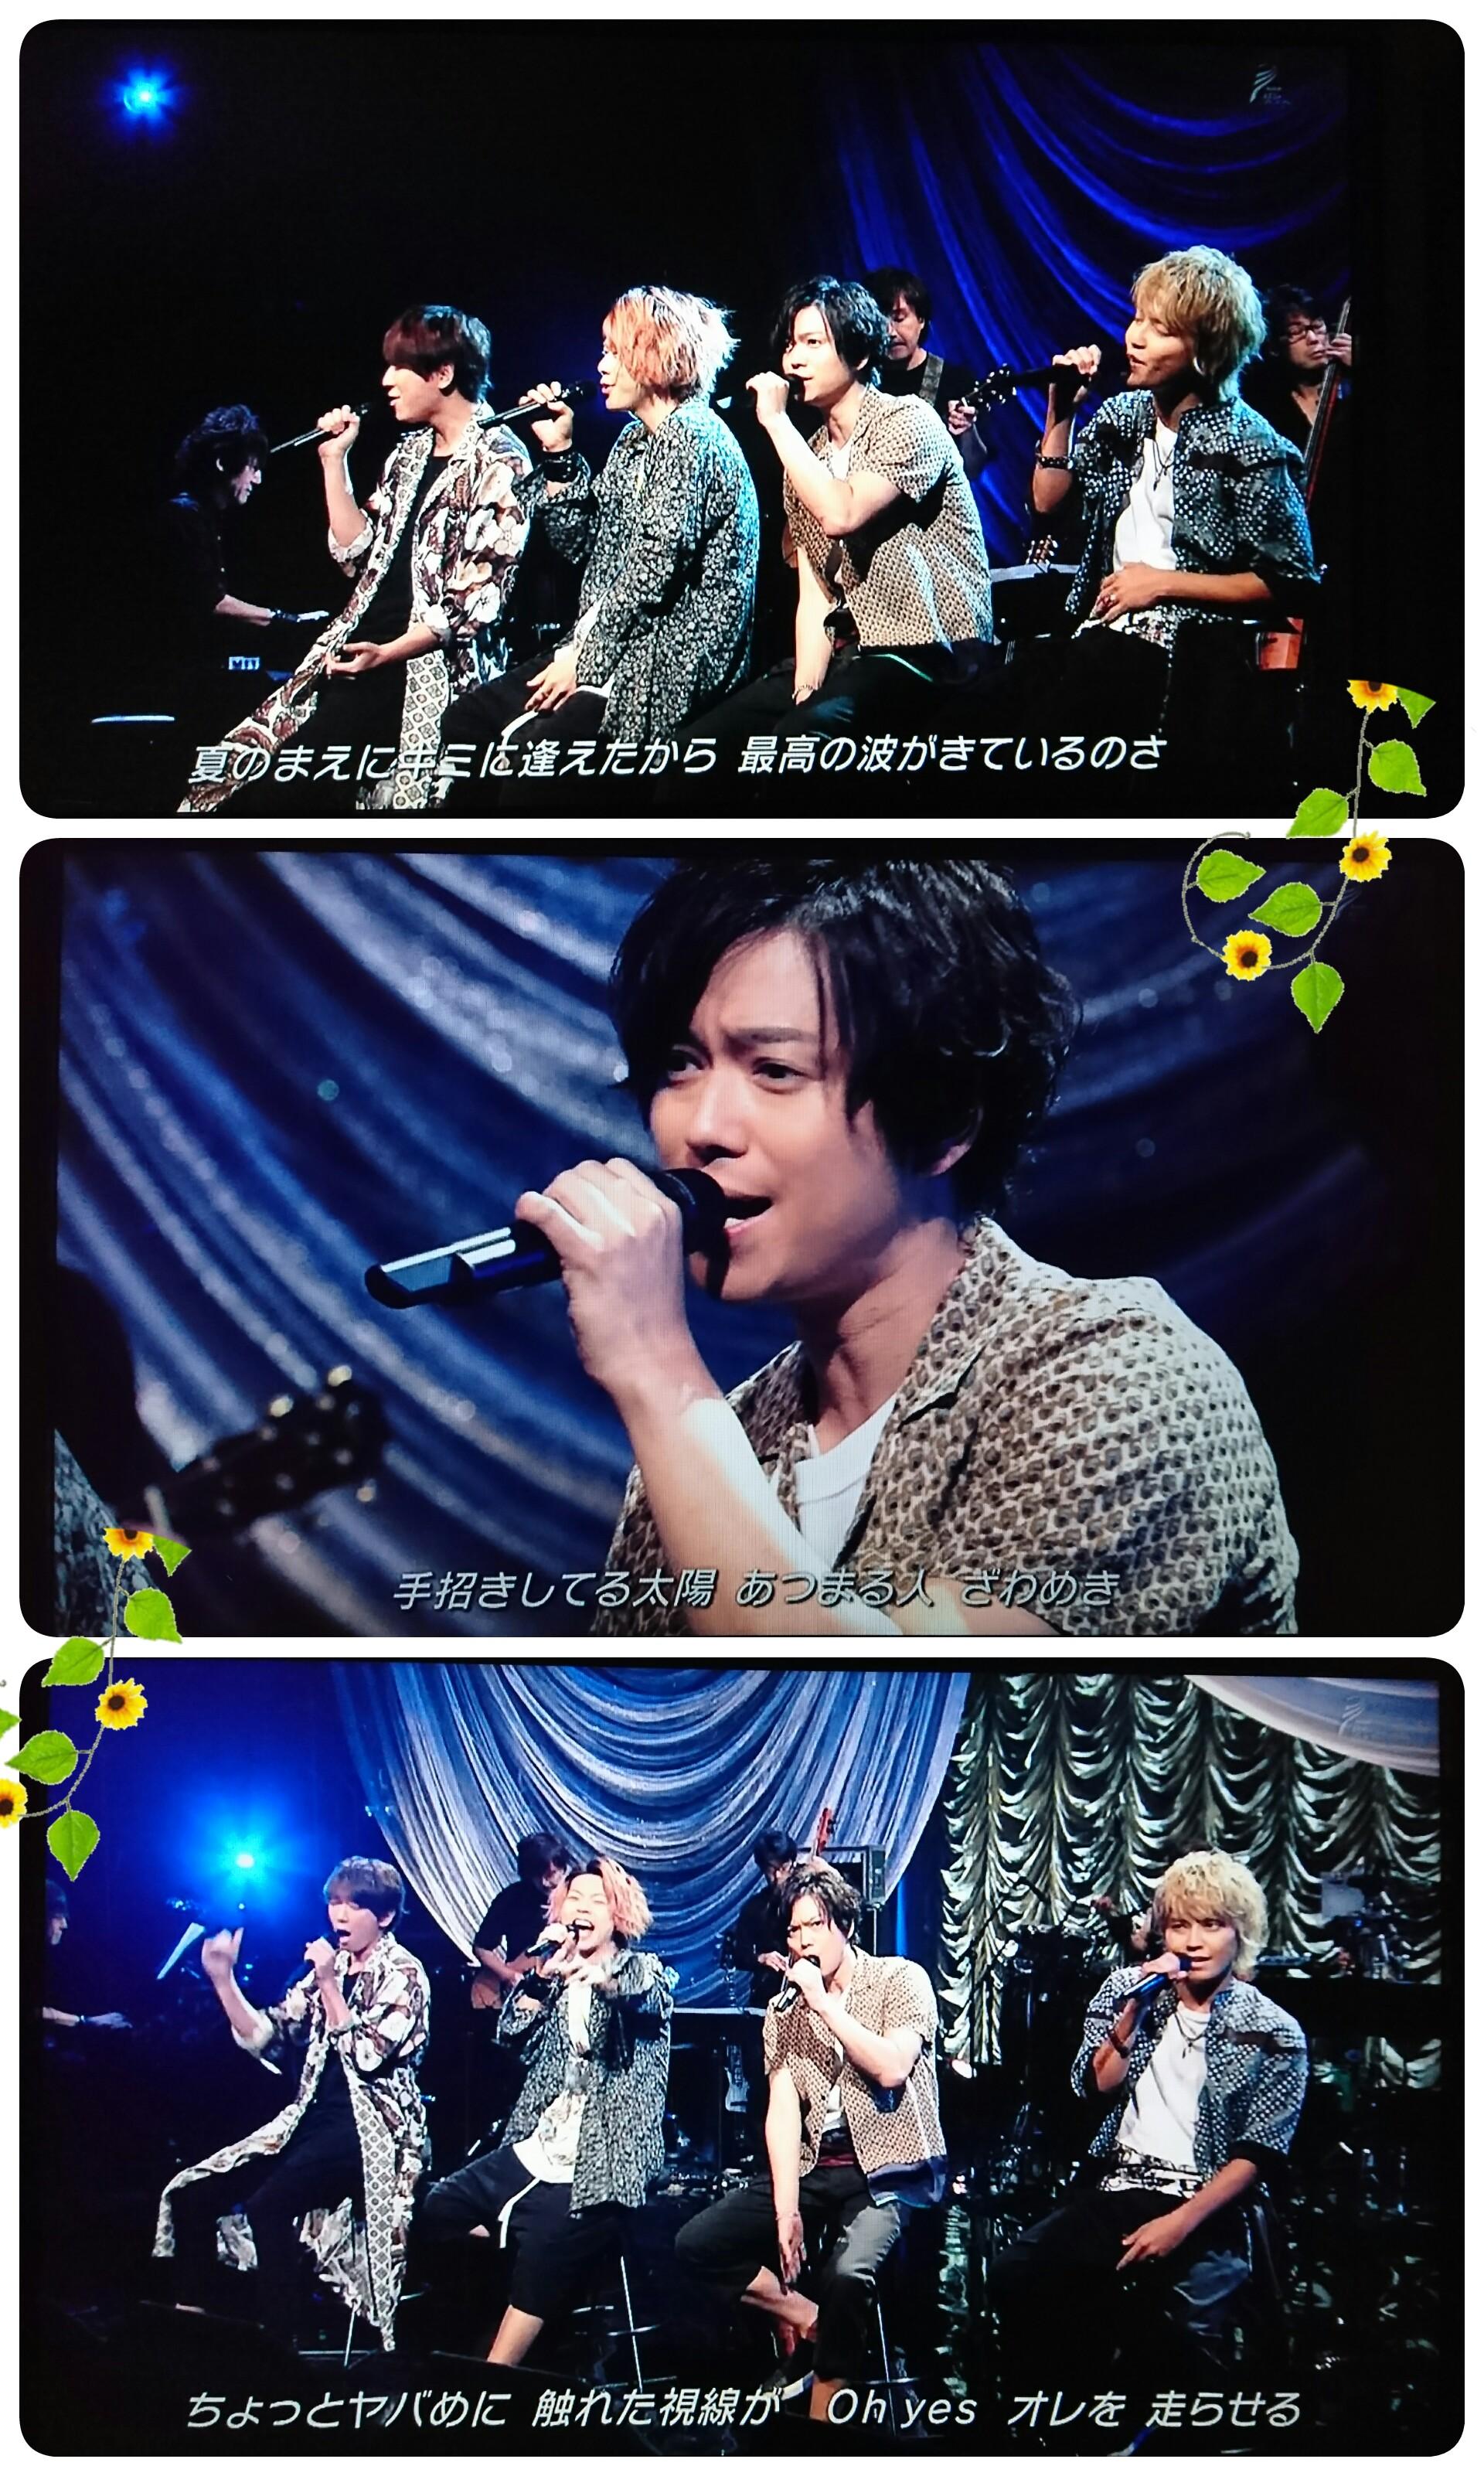 f:id:sunflower-shigeaki:20170831000816j:image